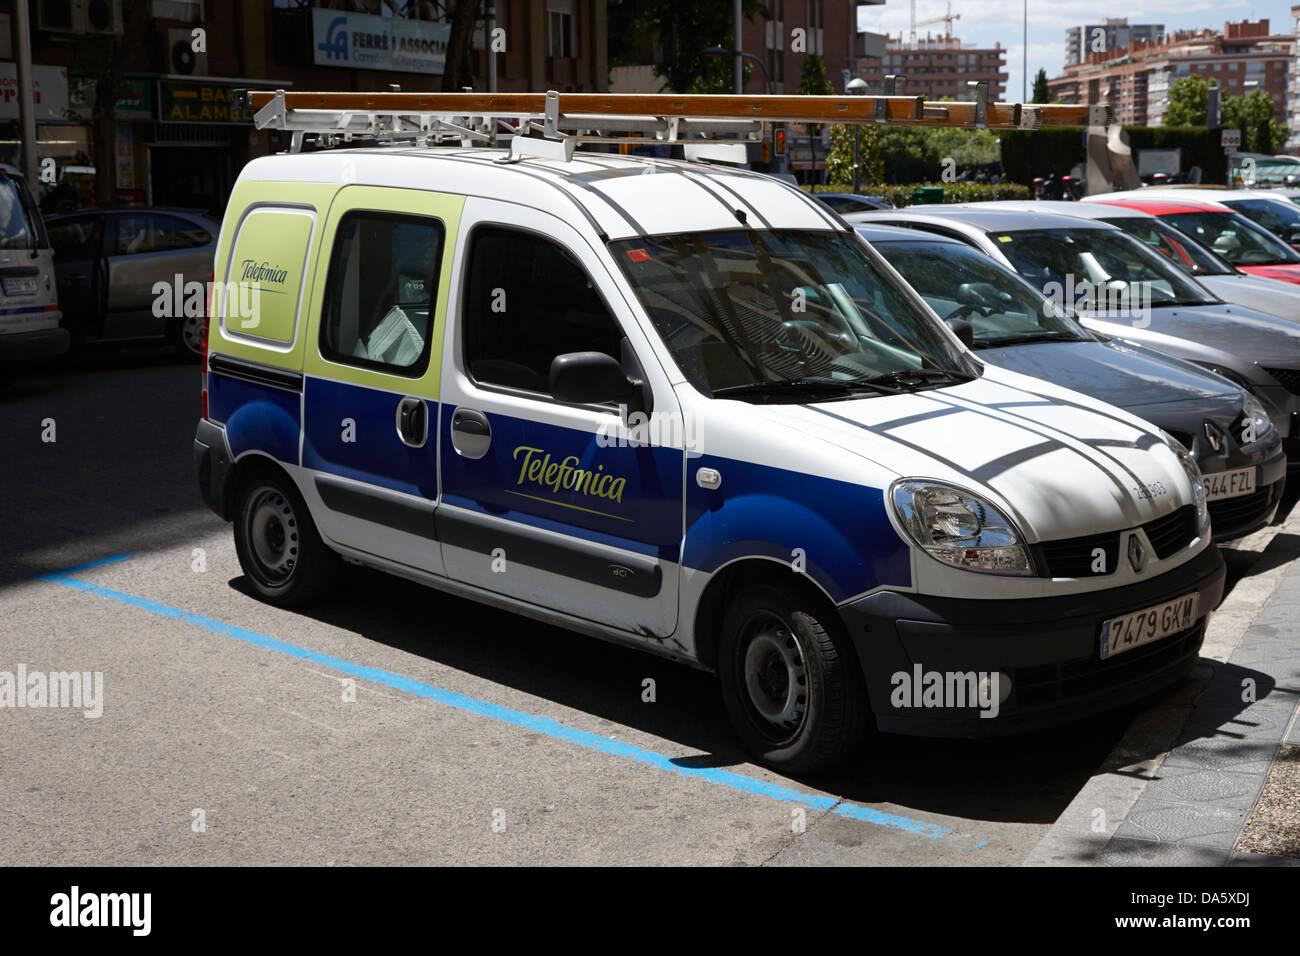 telefonica spanish telephone provider service vehicle in downtown tarragona catalonia spain - Stock Image